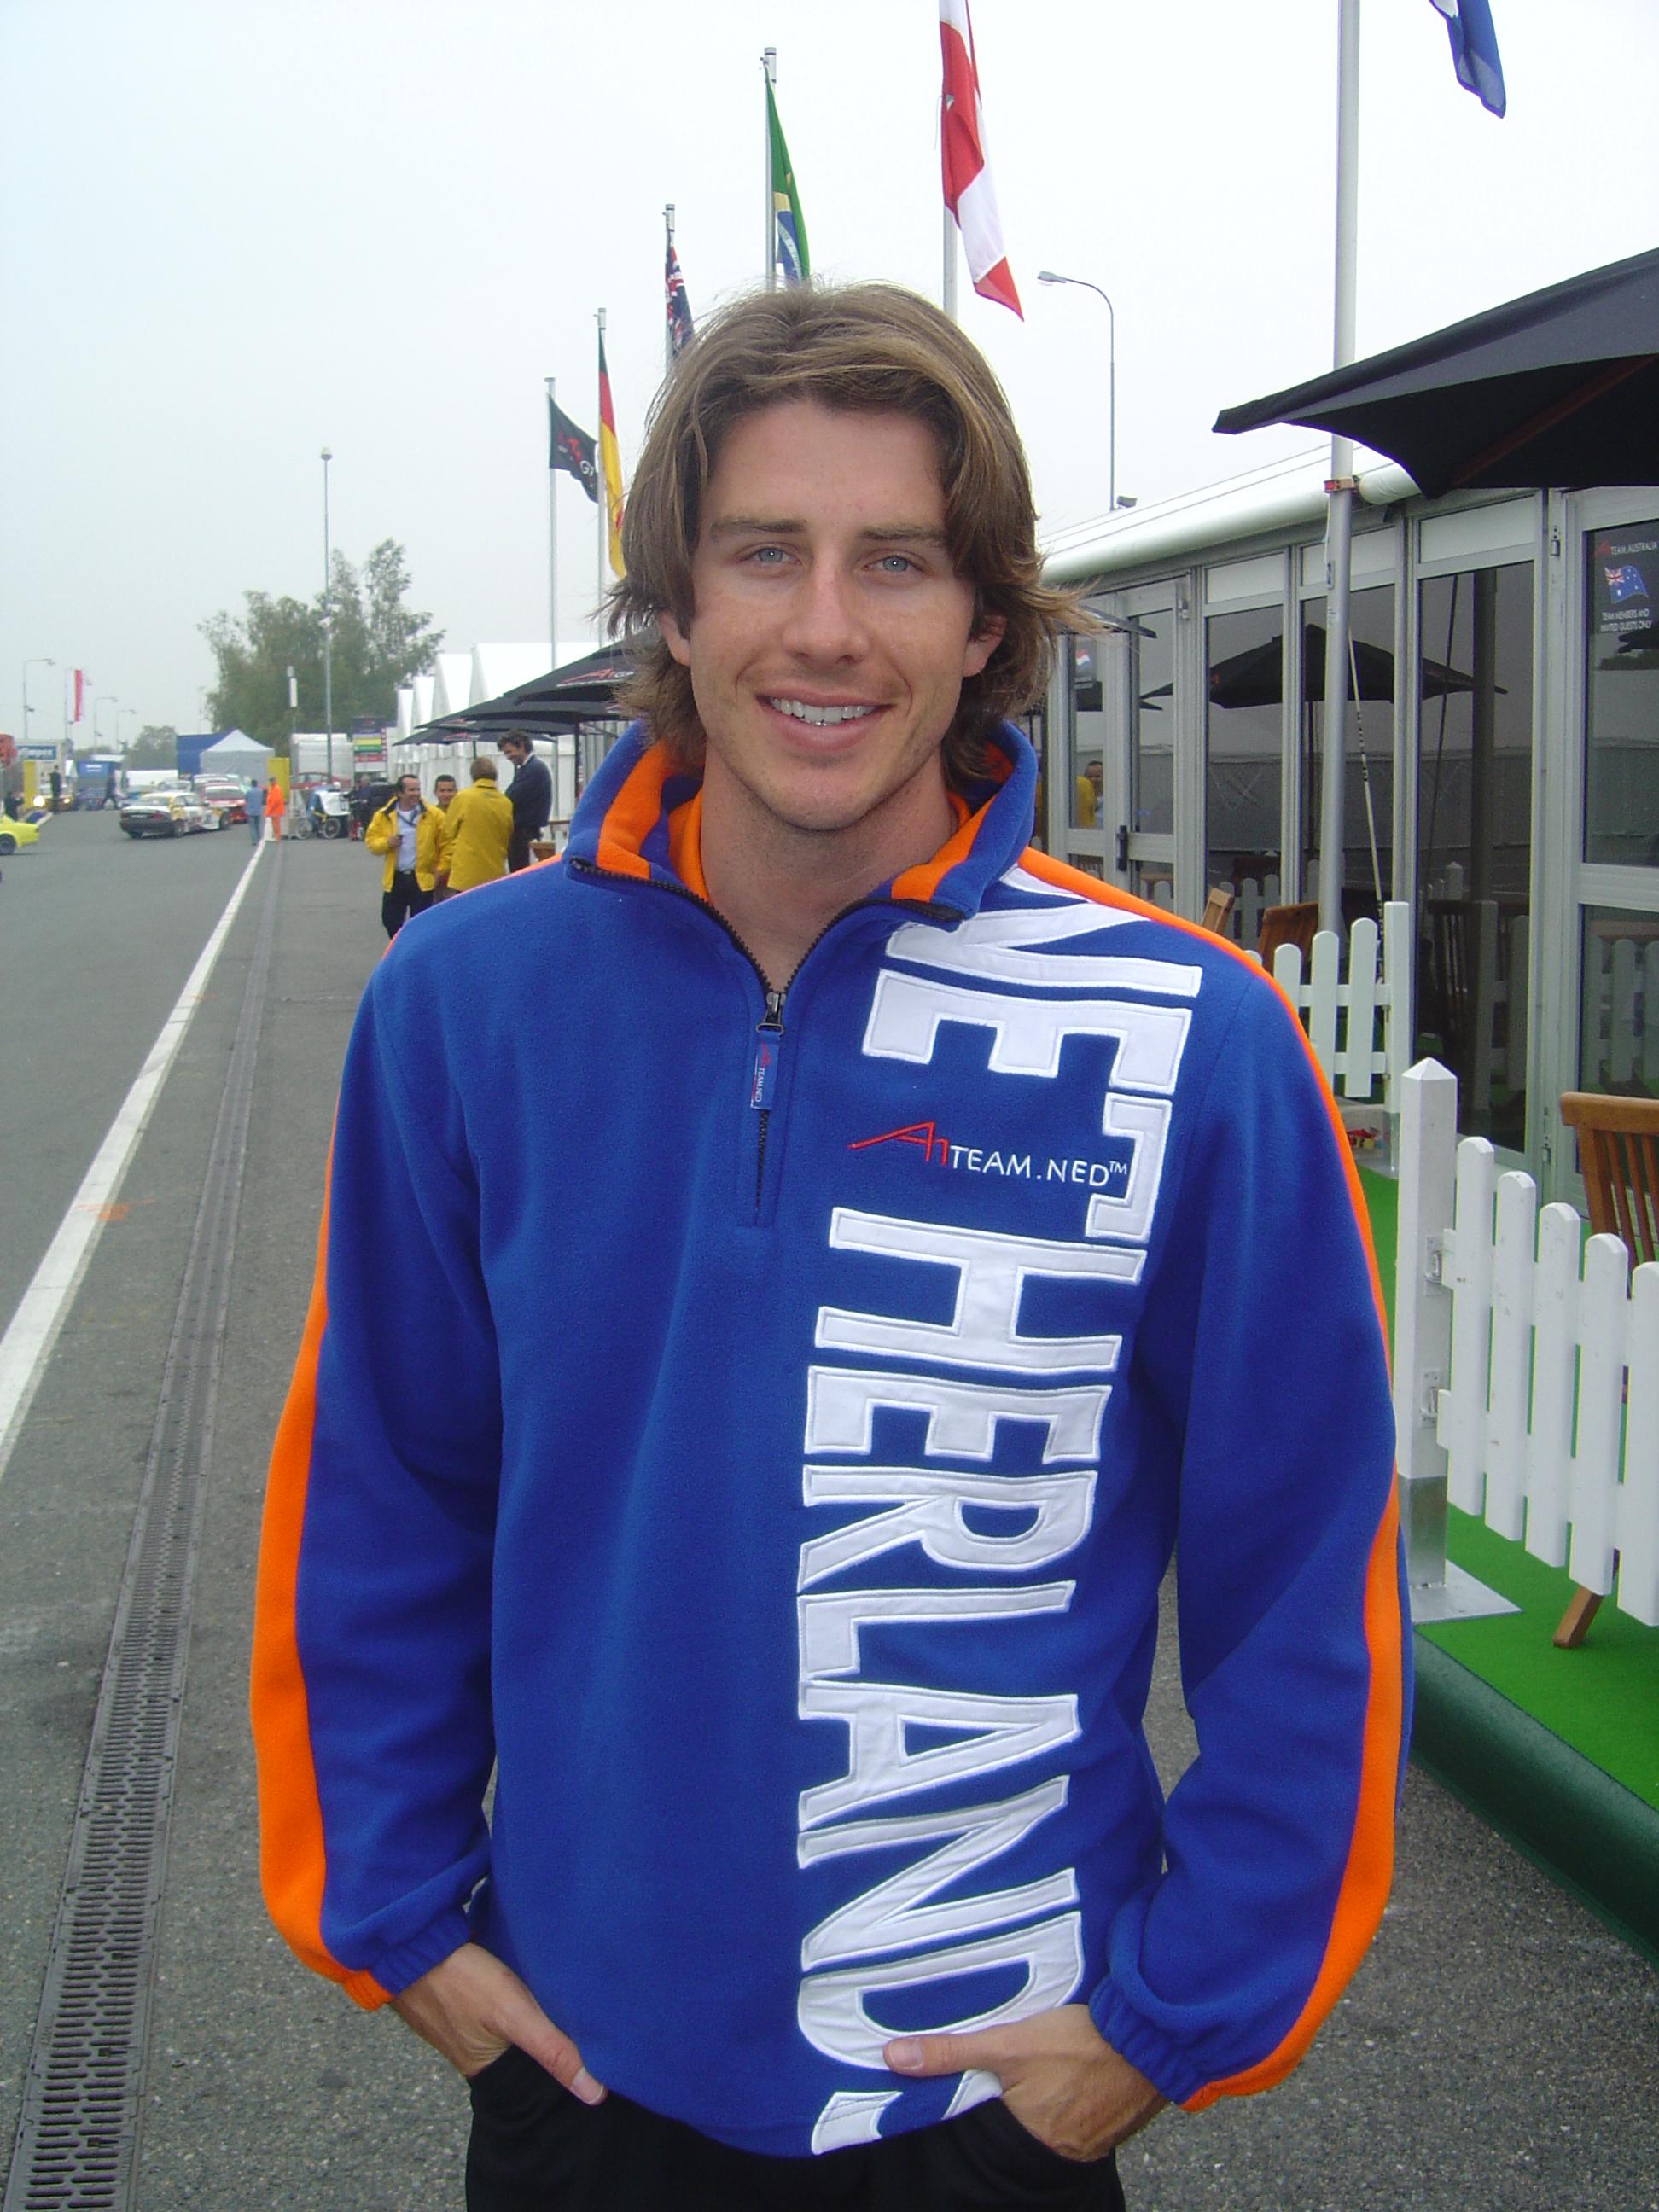 File:Arie Luyendyk jr.JPG - Wikimedia Commons Race 2